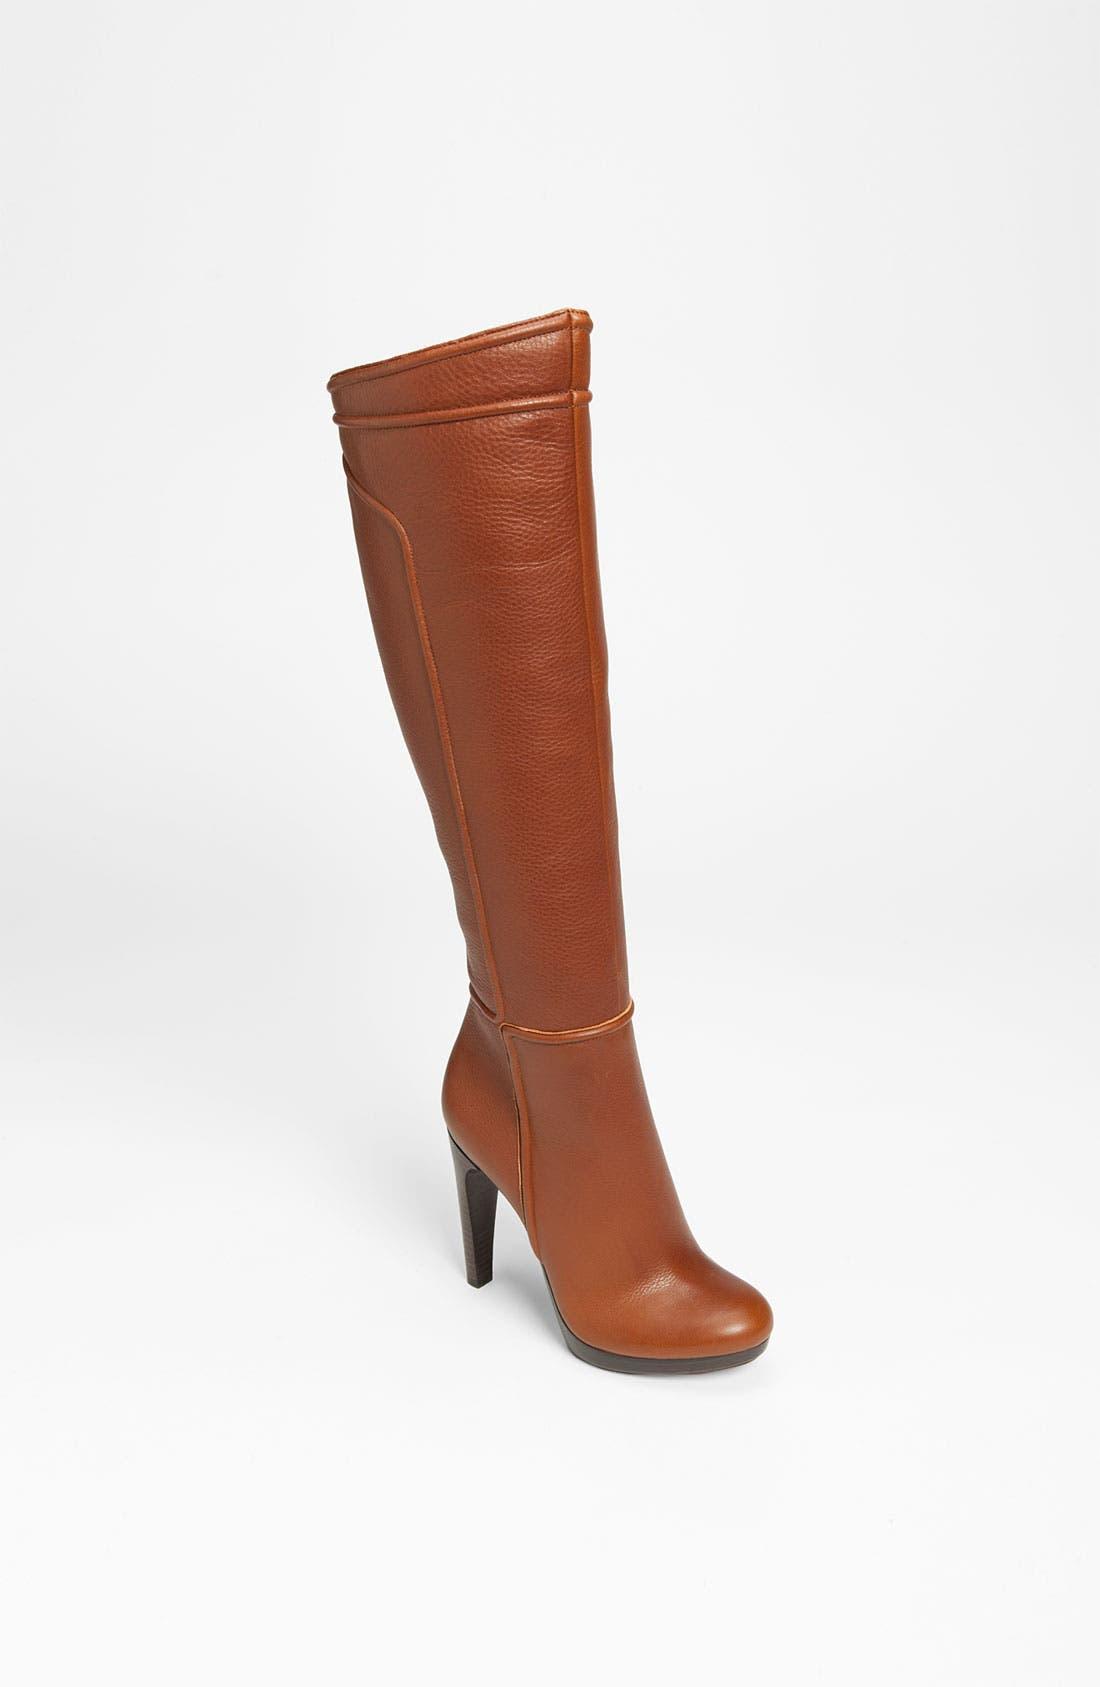 Alternate Image 1 Selected - Rachel Zoe 'Chloe' Boot